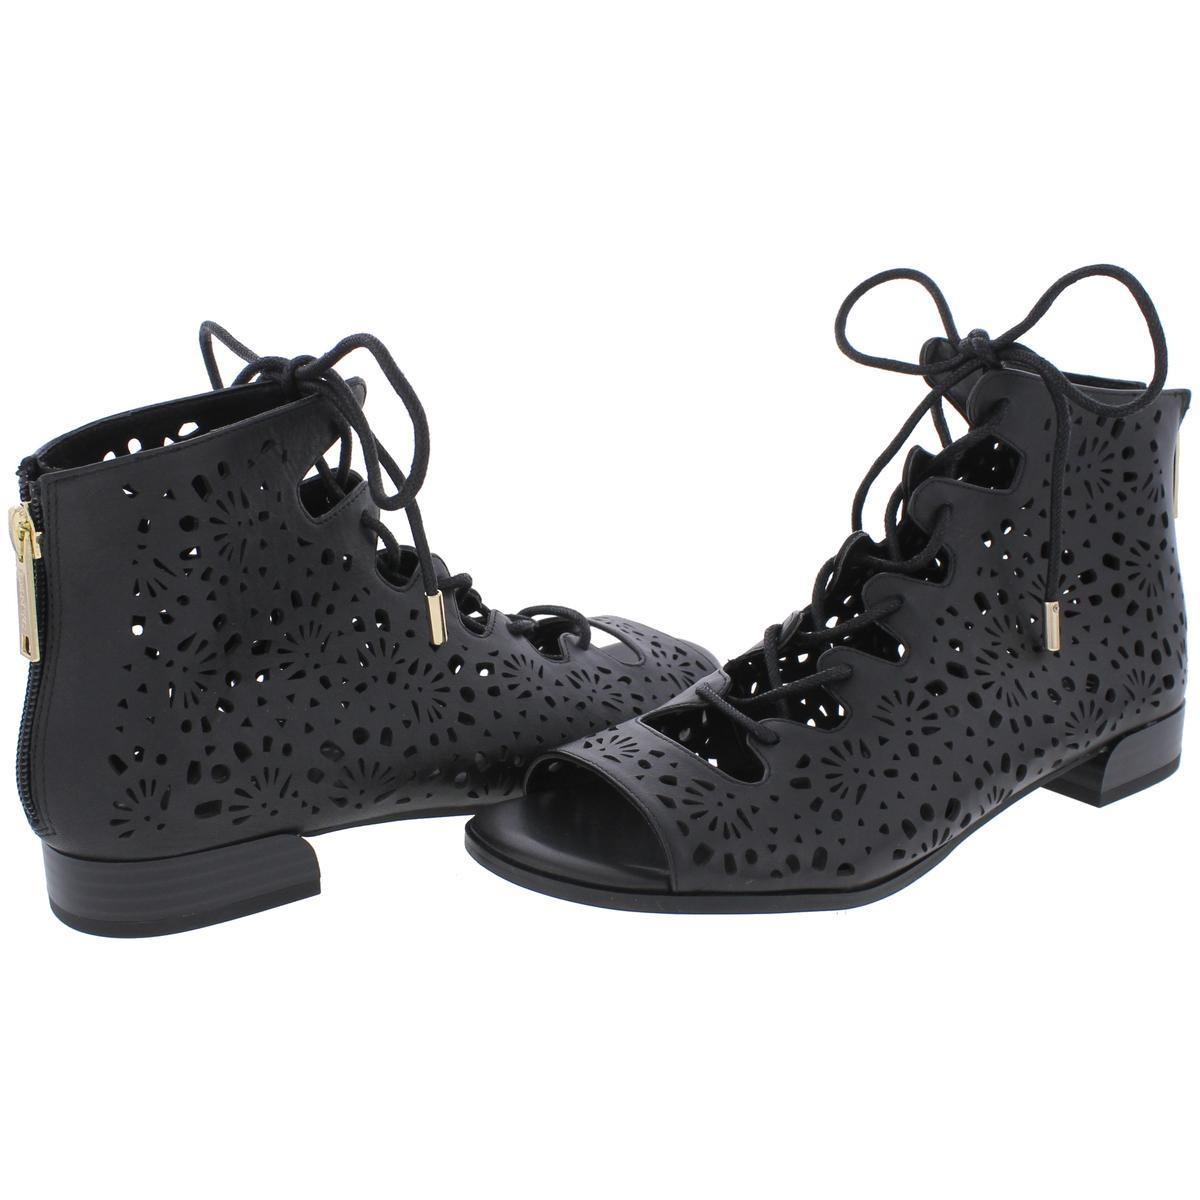 IMNYC-Isaac-Mizrahi-Womens-Lonnie-Leather-Open-Toe-Flat-Sandals-Shoes-BHFO-3034 thumbnail 6